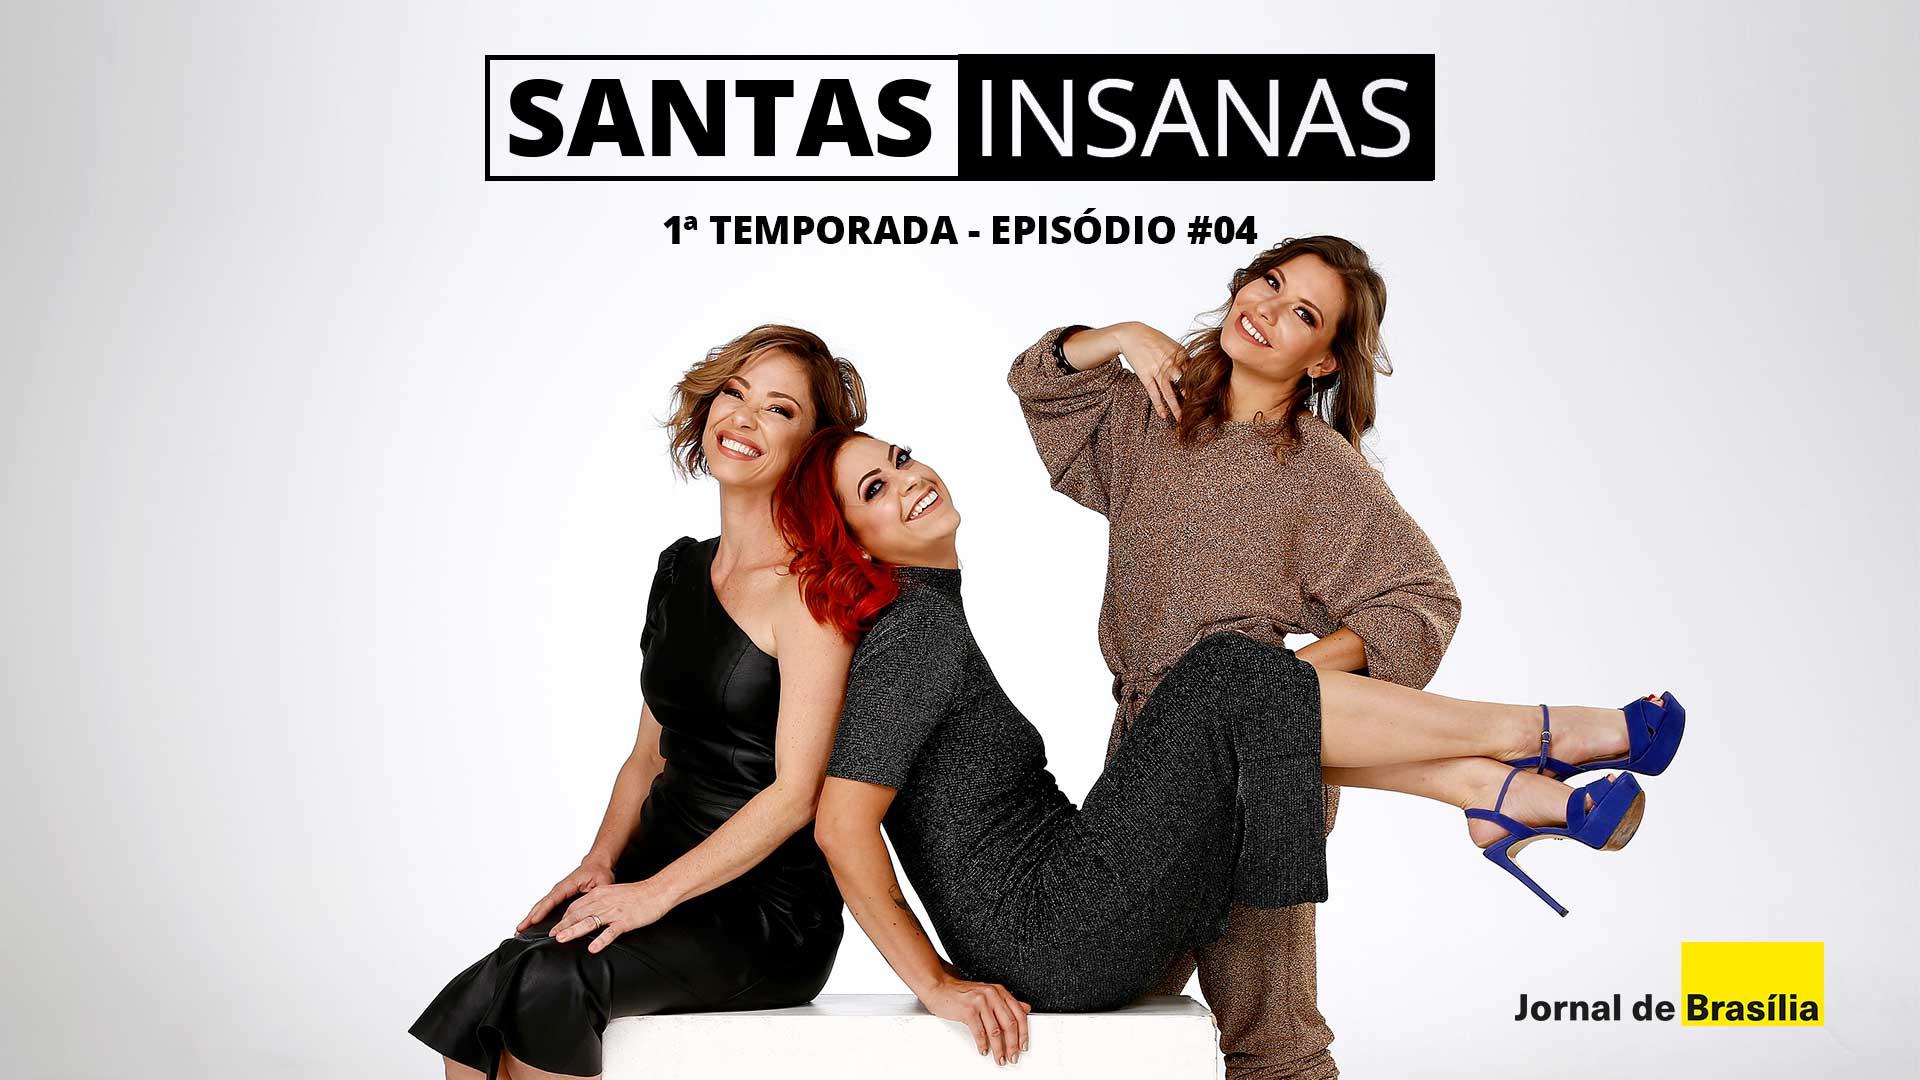 Santas Insanas - 1ª Temporada - Episódio #04